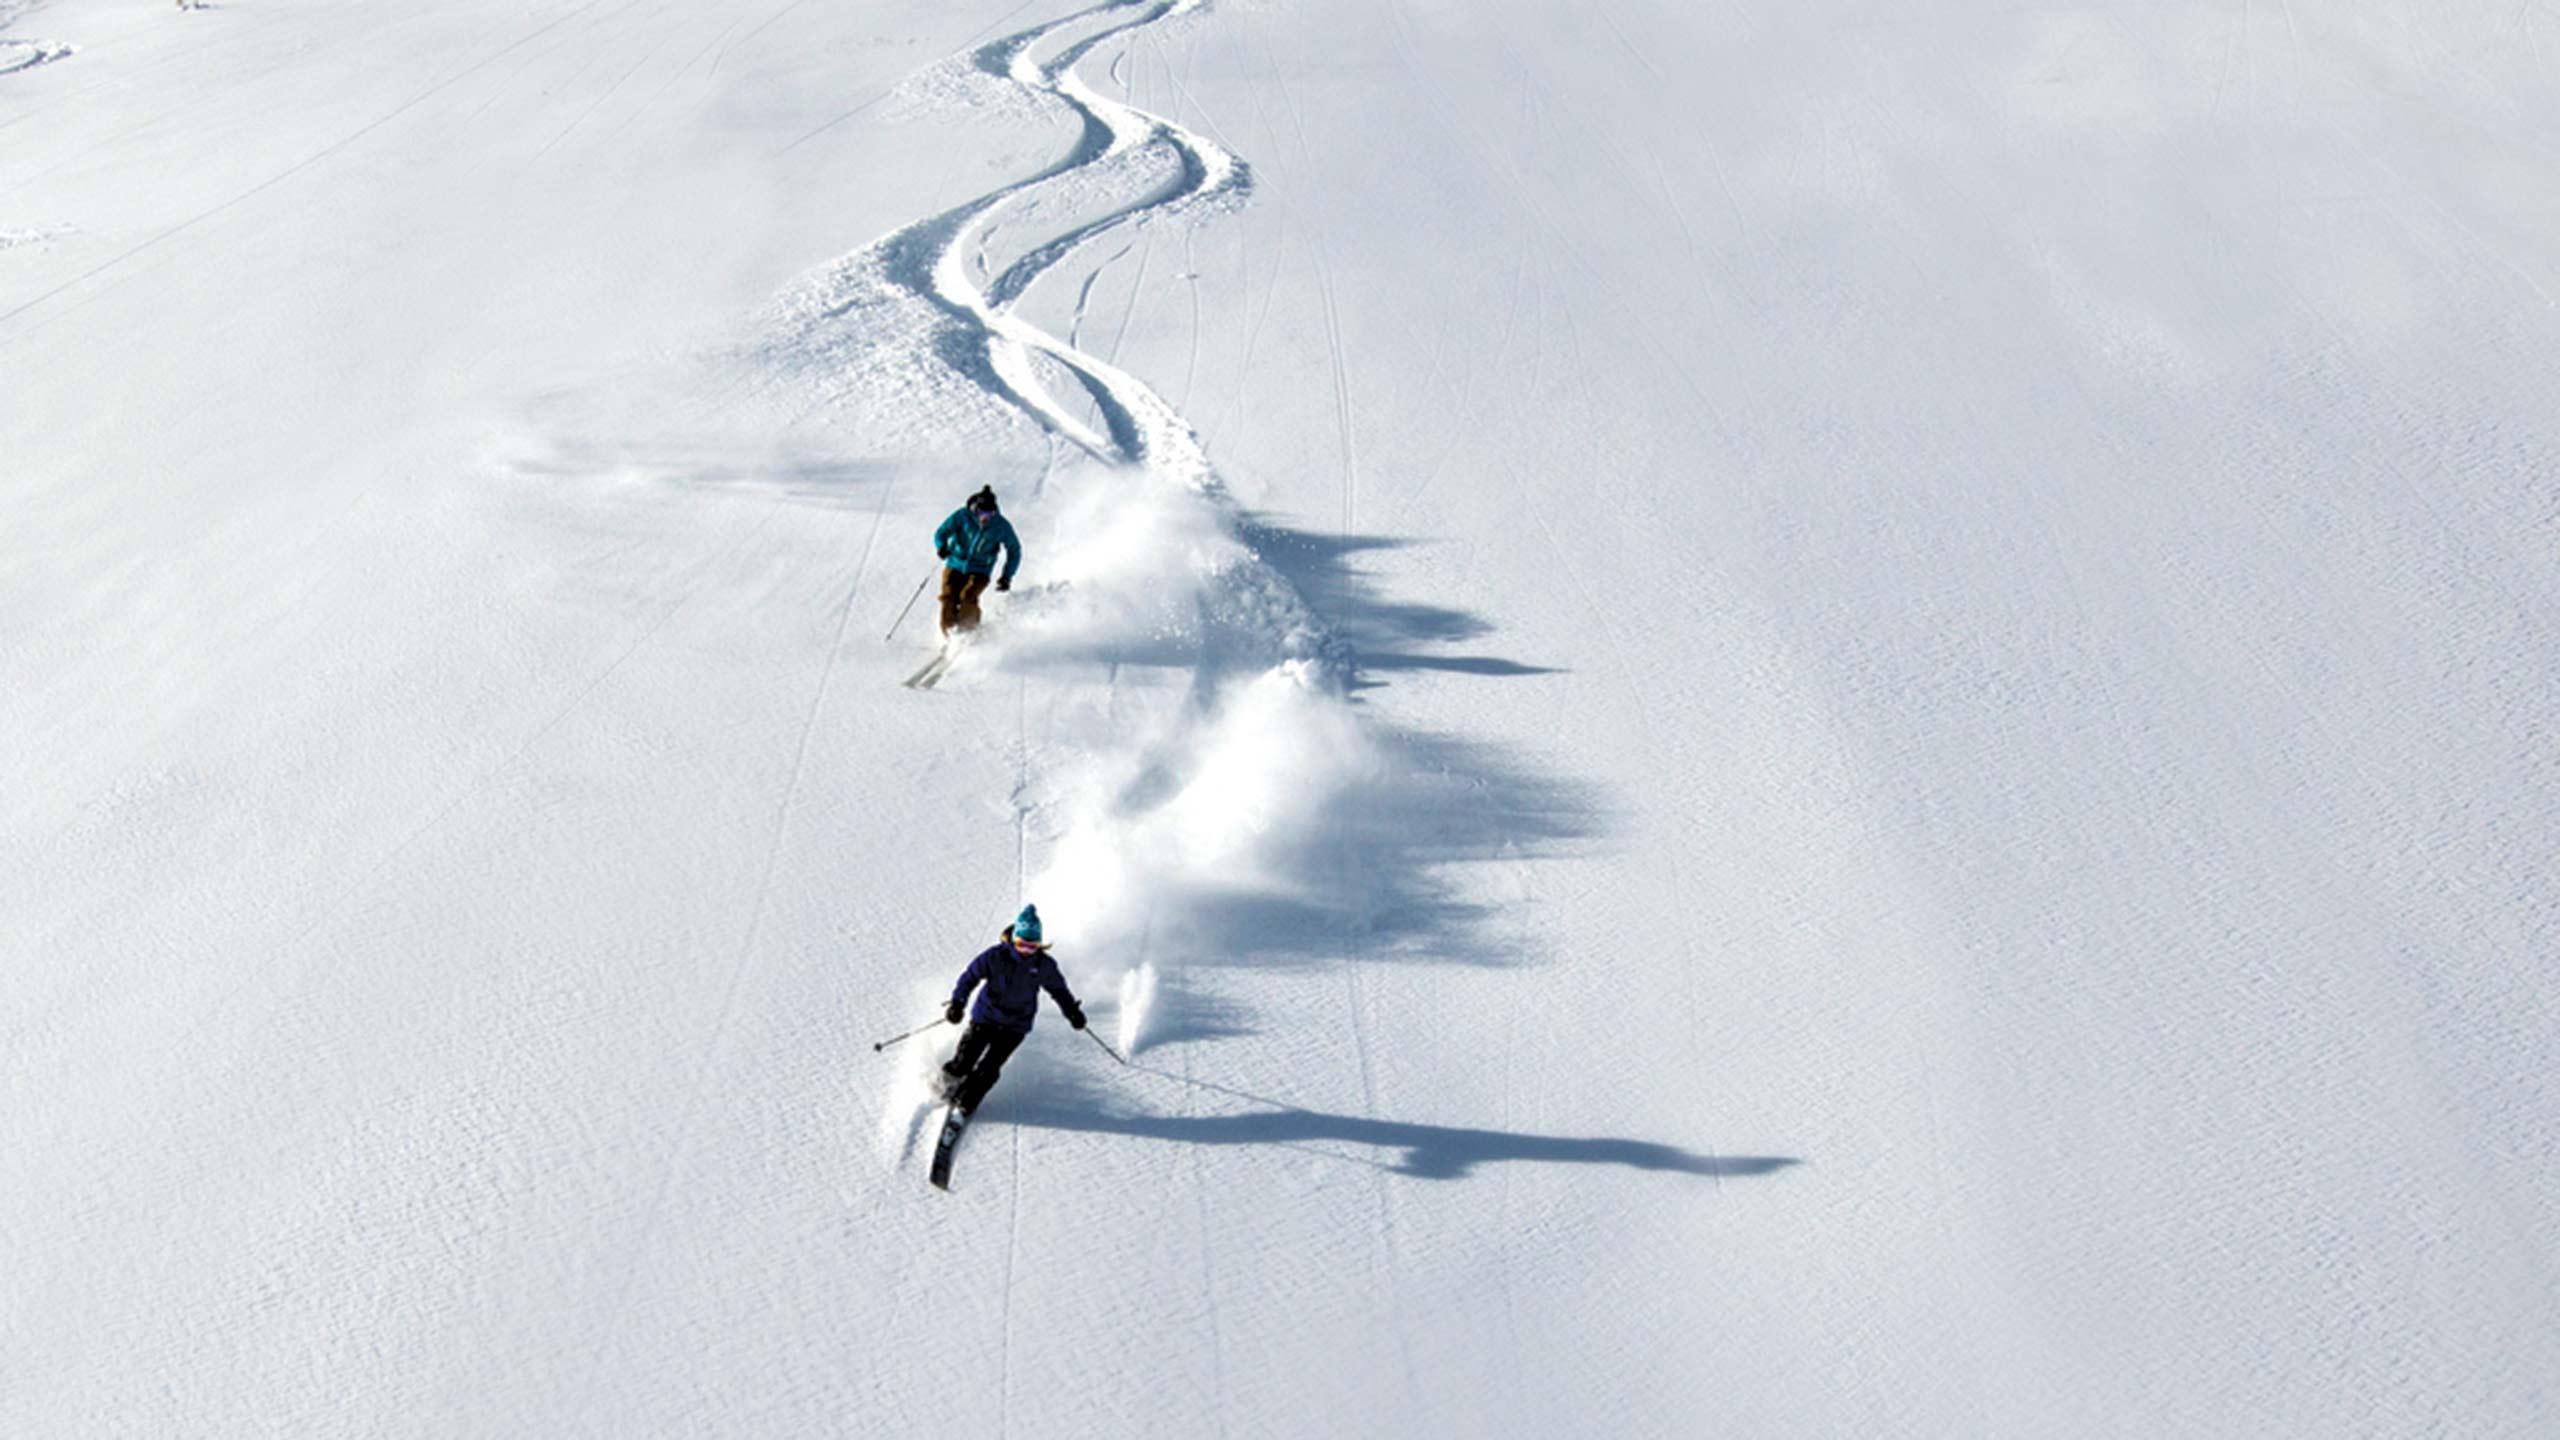 Silver Skiers Taking Turns in Powder